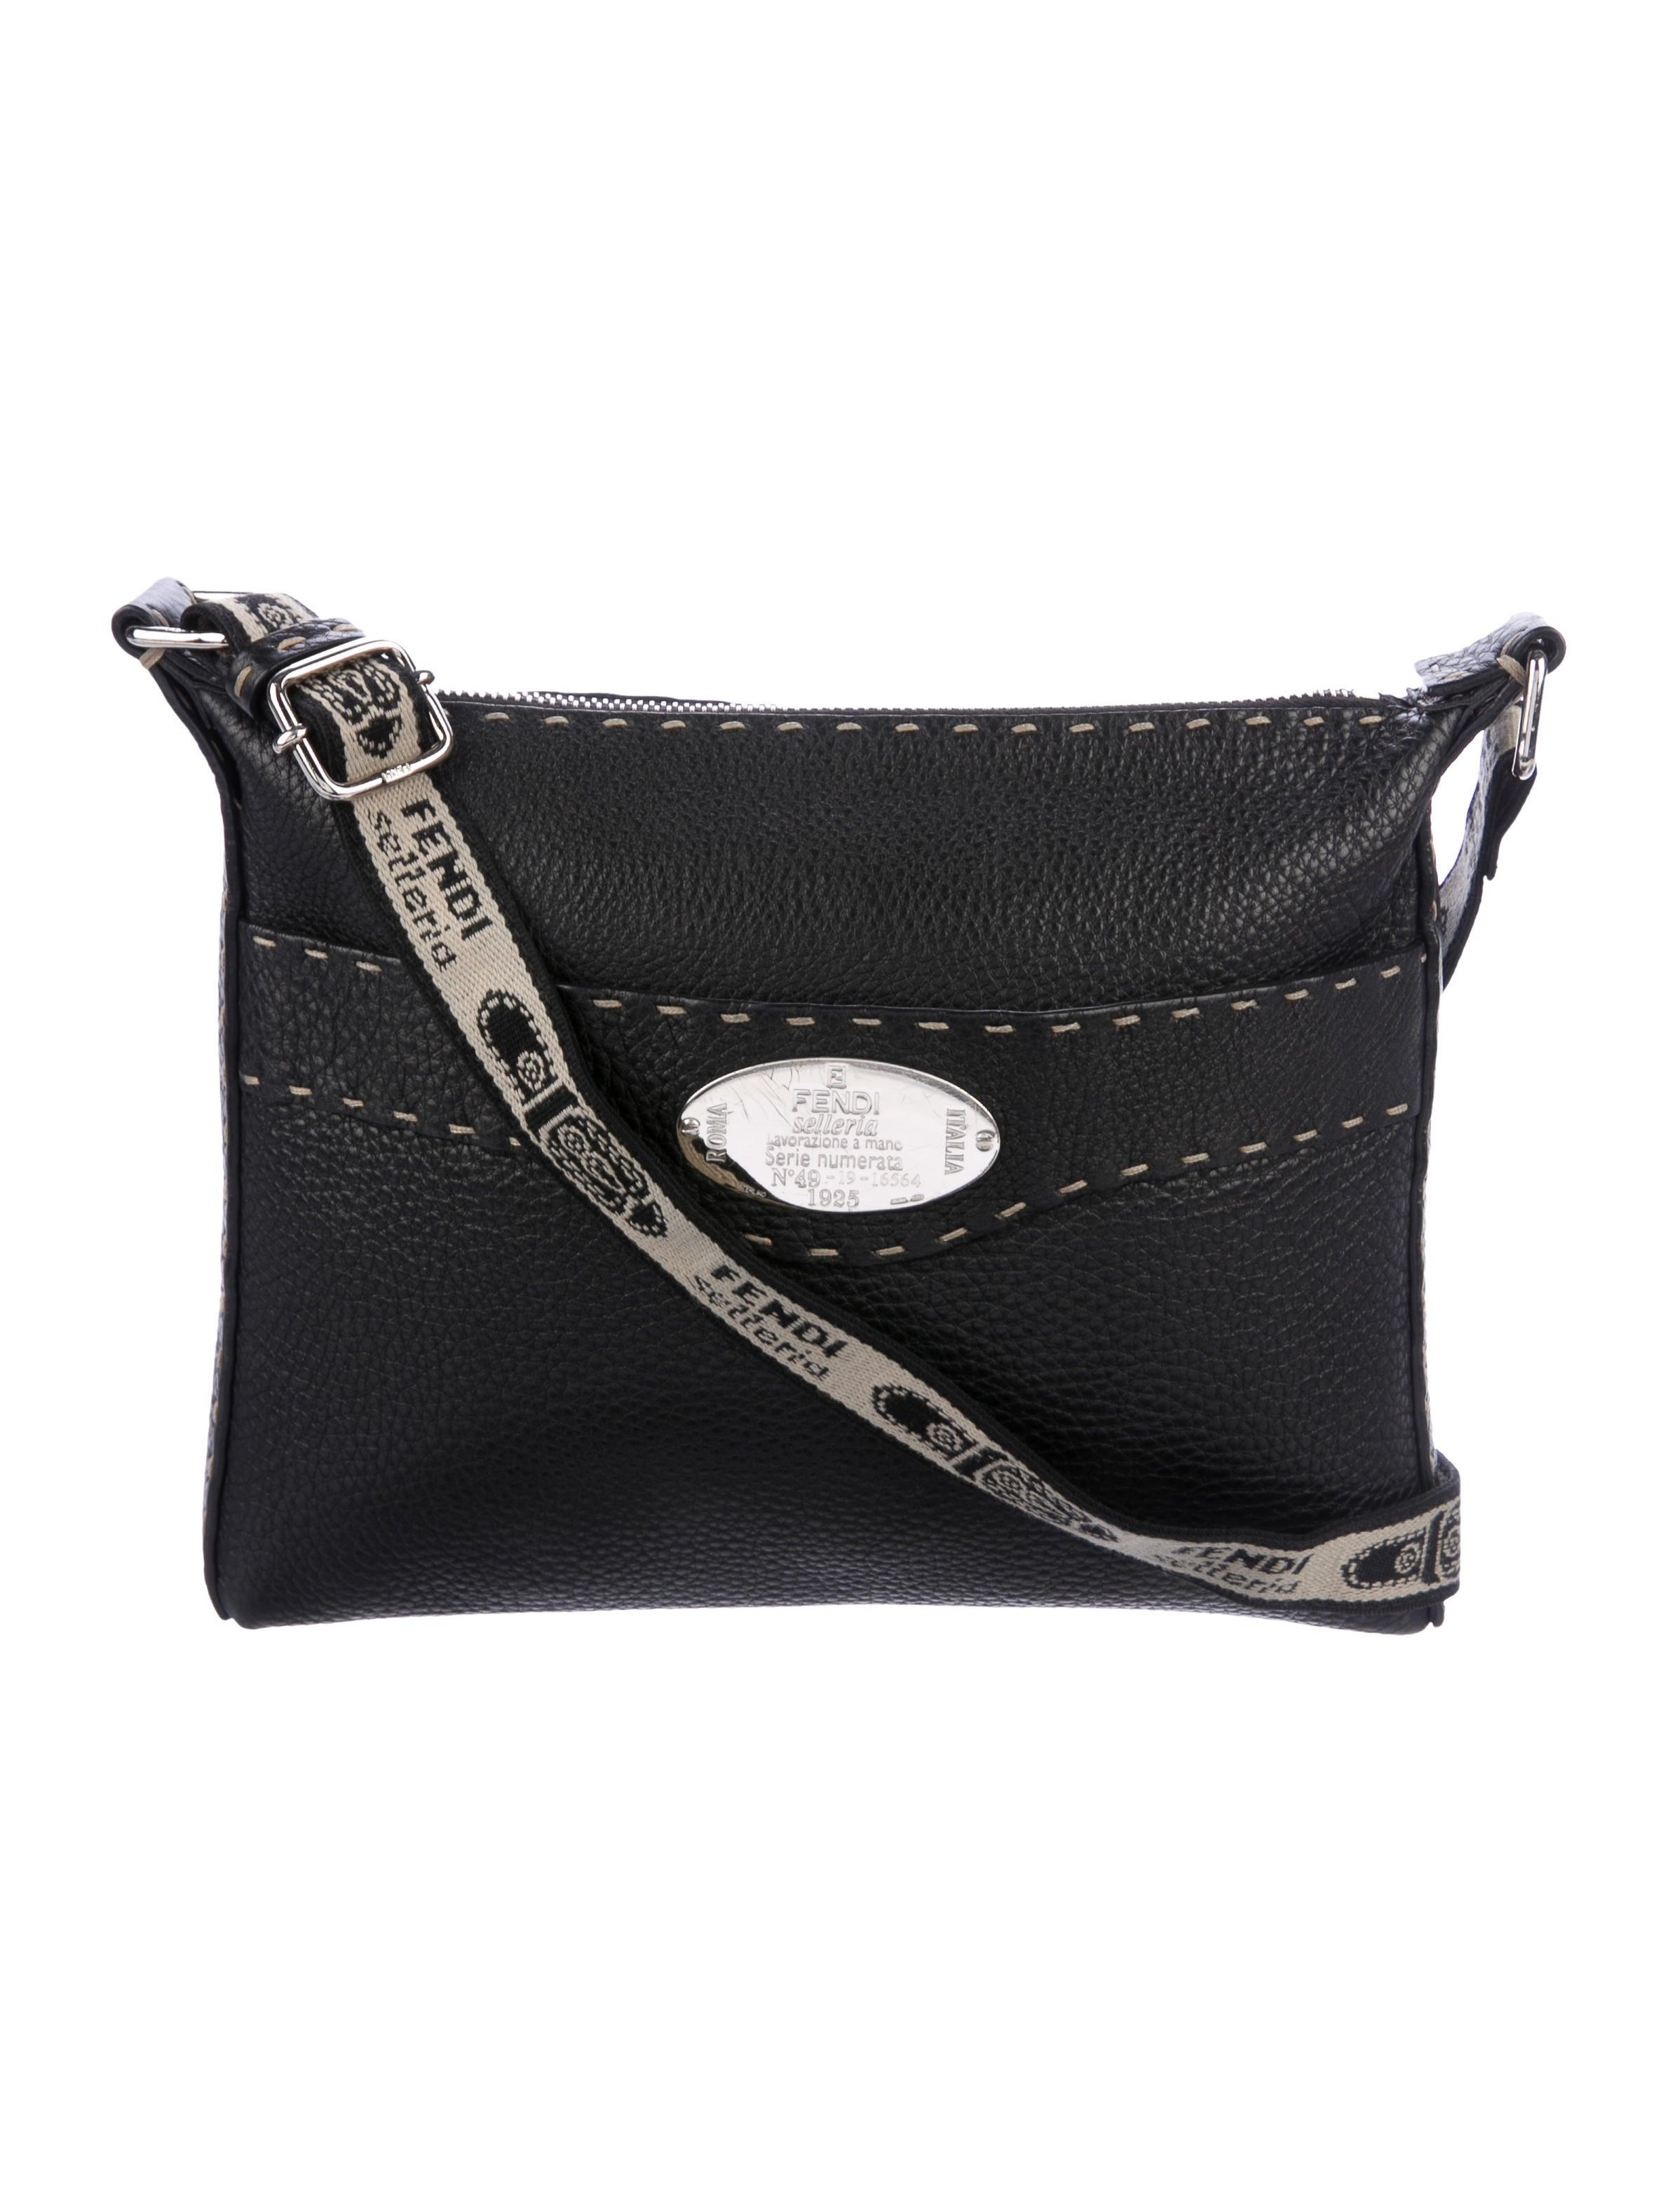 f508ba6d4249 Fendi Leather Selleria Crossbody Bag - Handbags - FEN73501